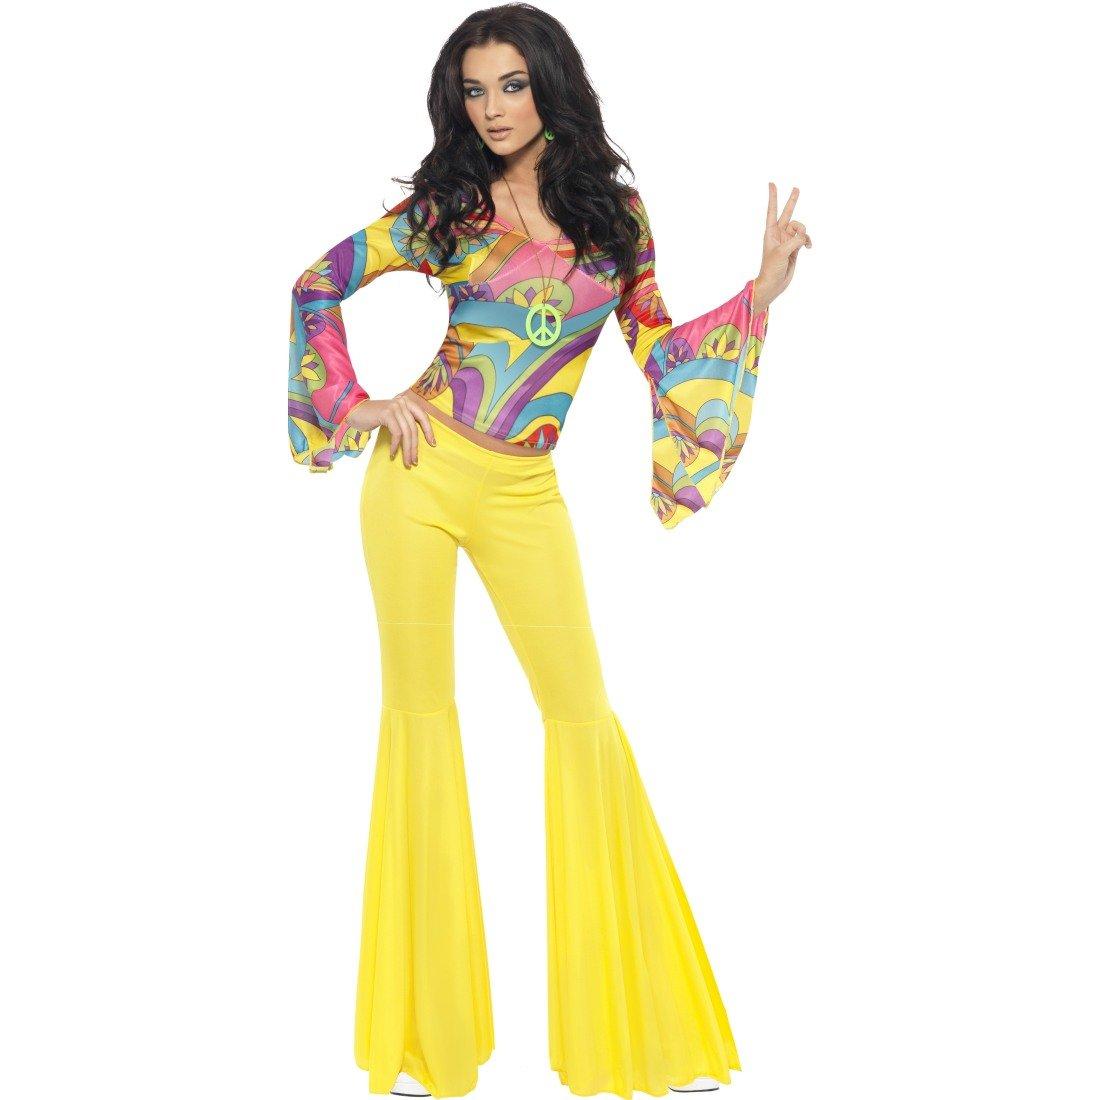 Retro Party Faschingskostüm 70er Jahre Damenkostüm Flower Power Damen Outfit